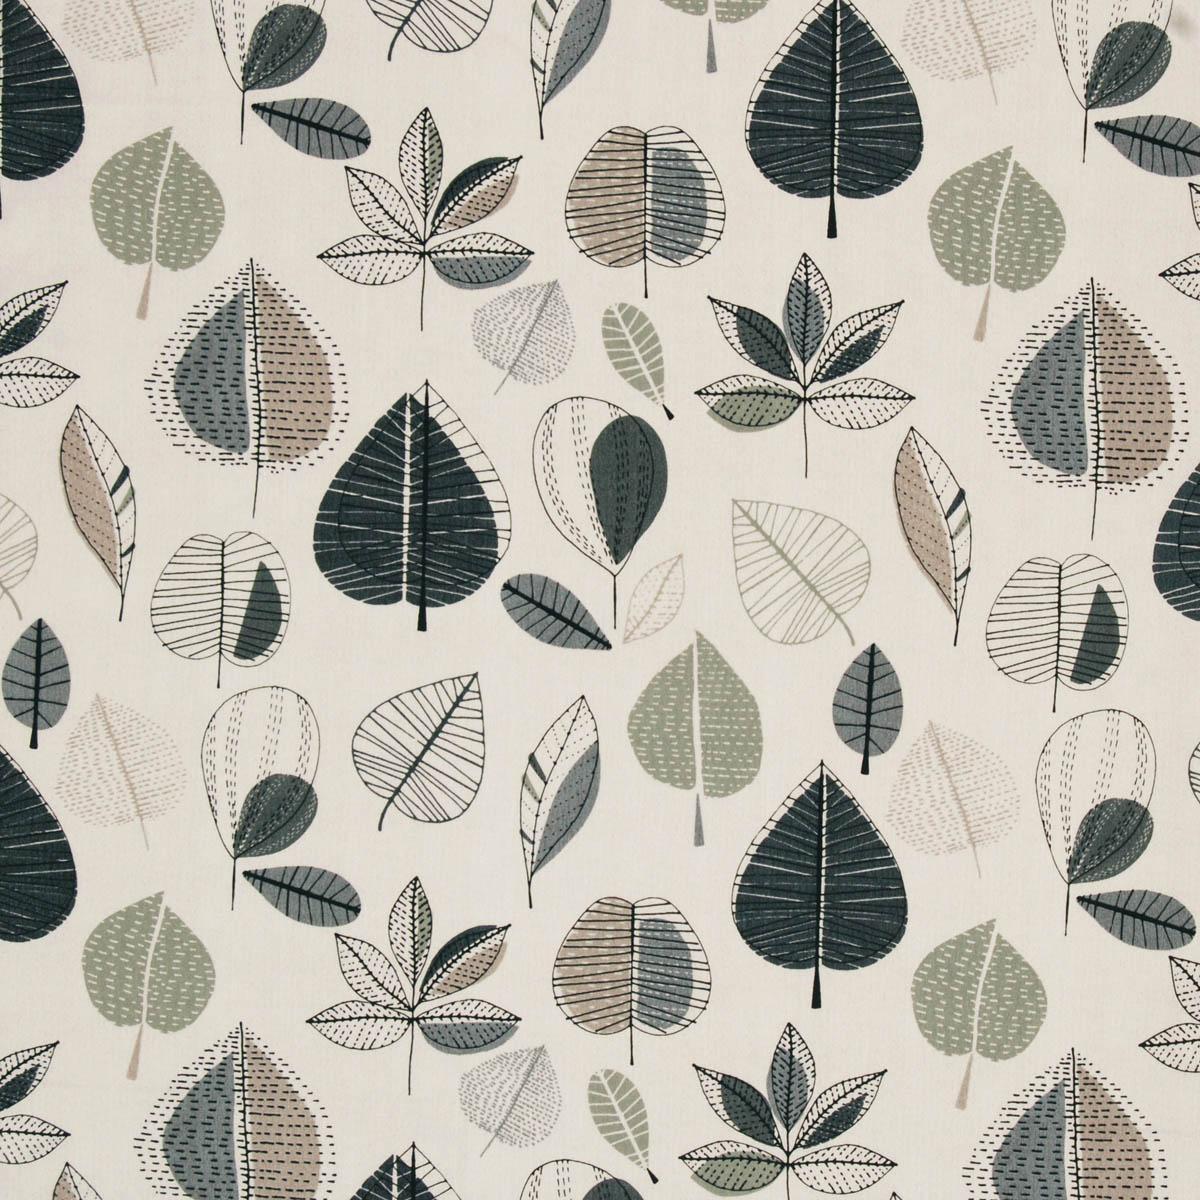 Maple Curtain Fabric Linen Cheap Printed Curtain Fabric